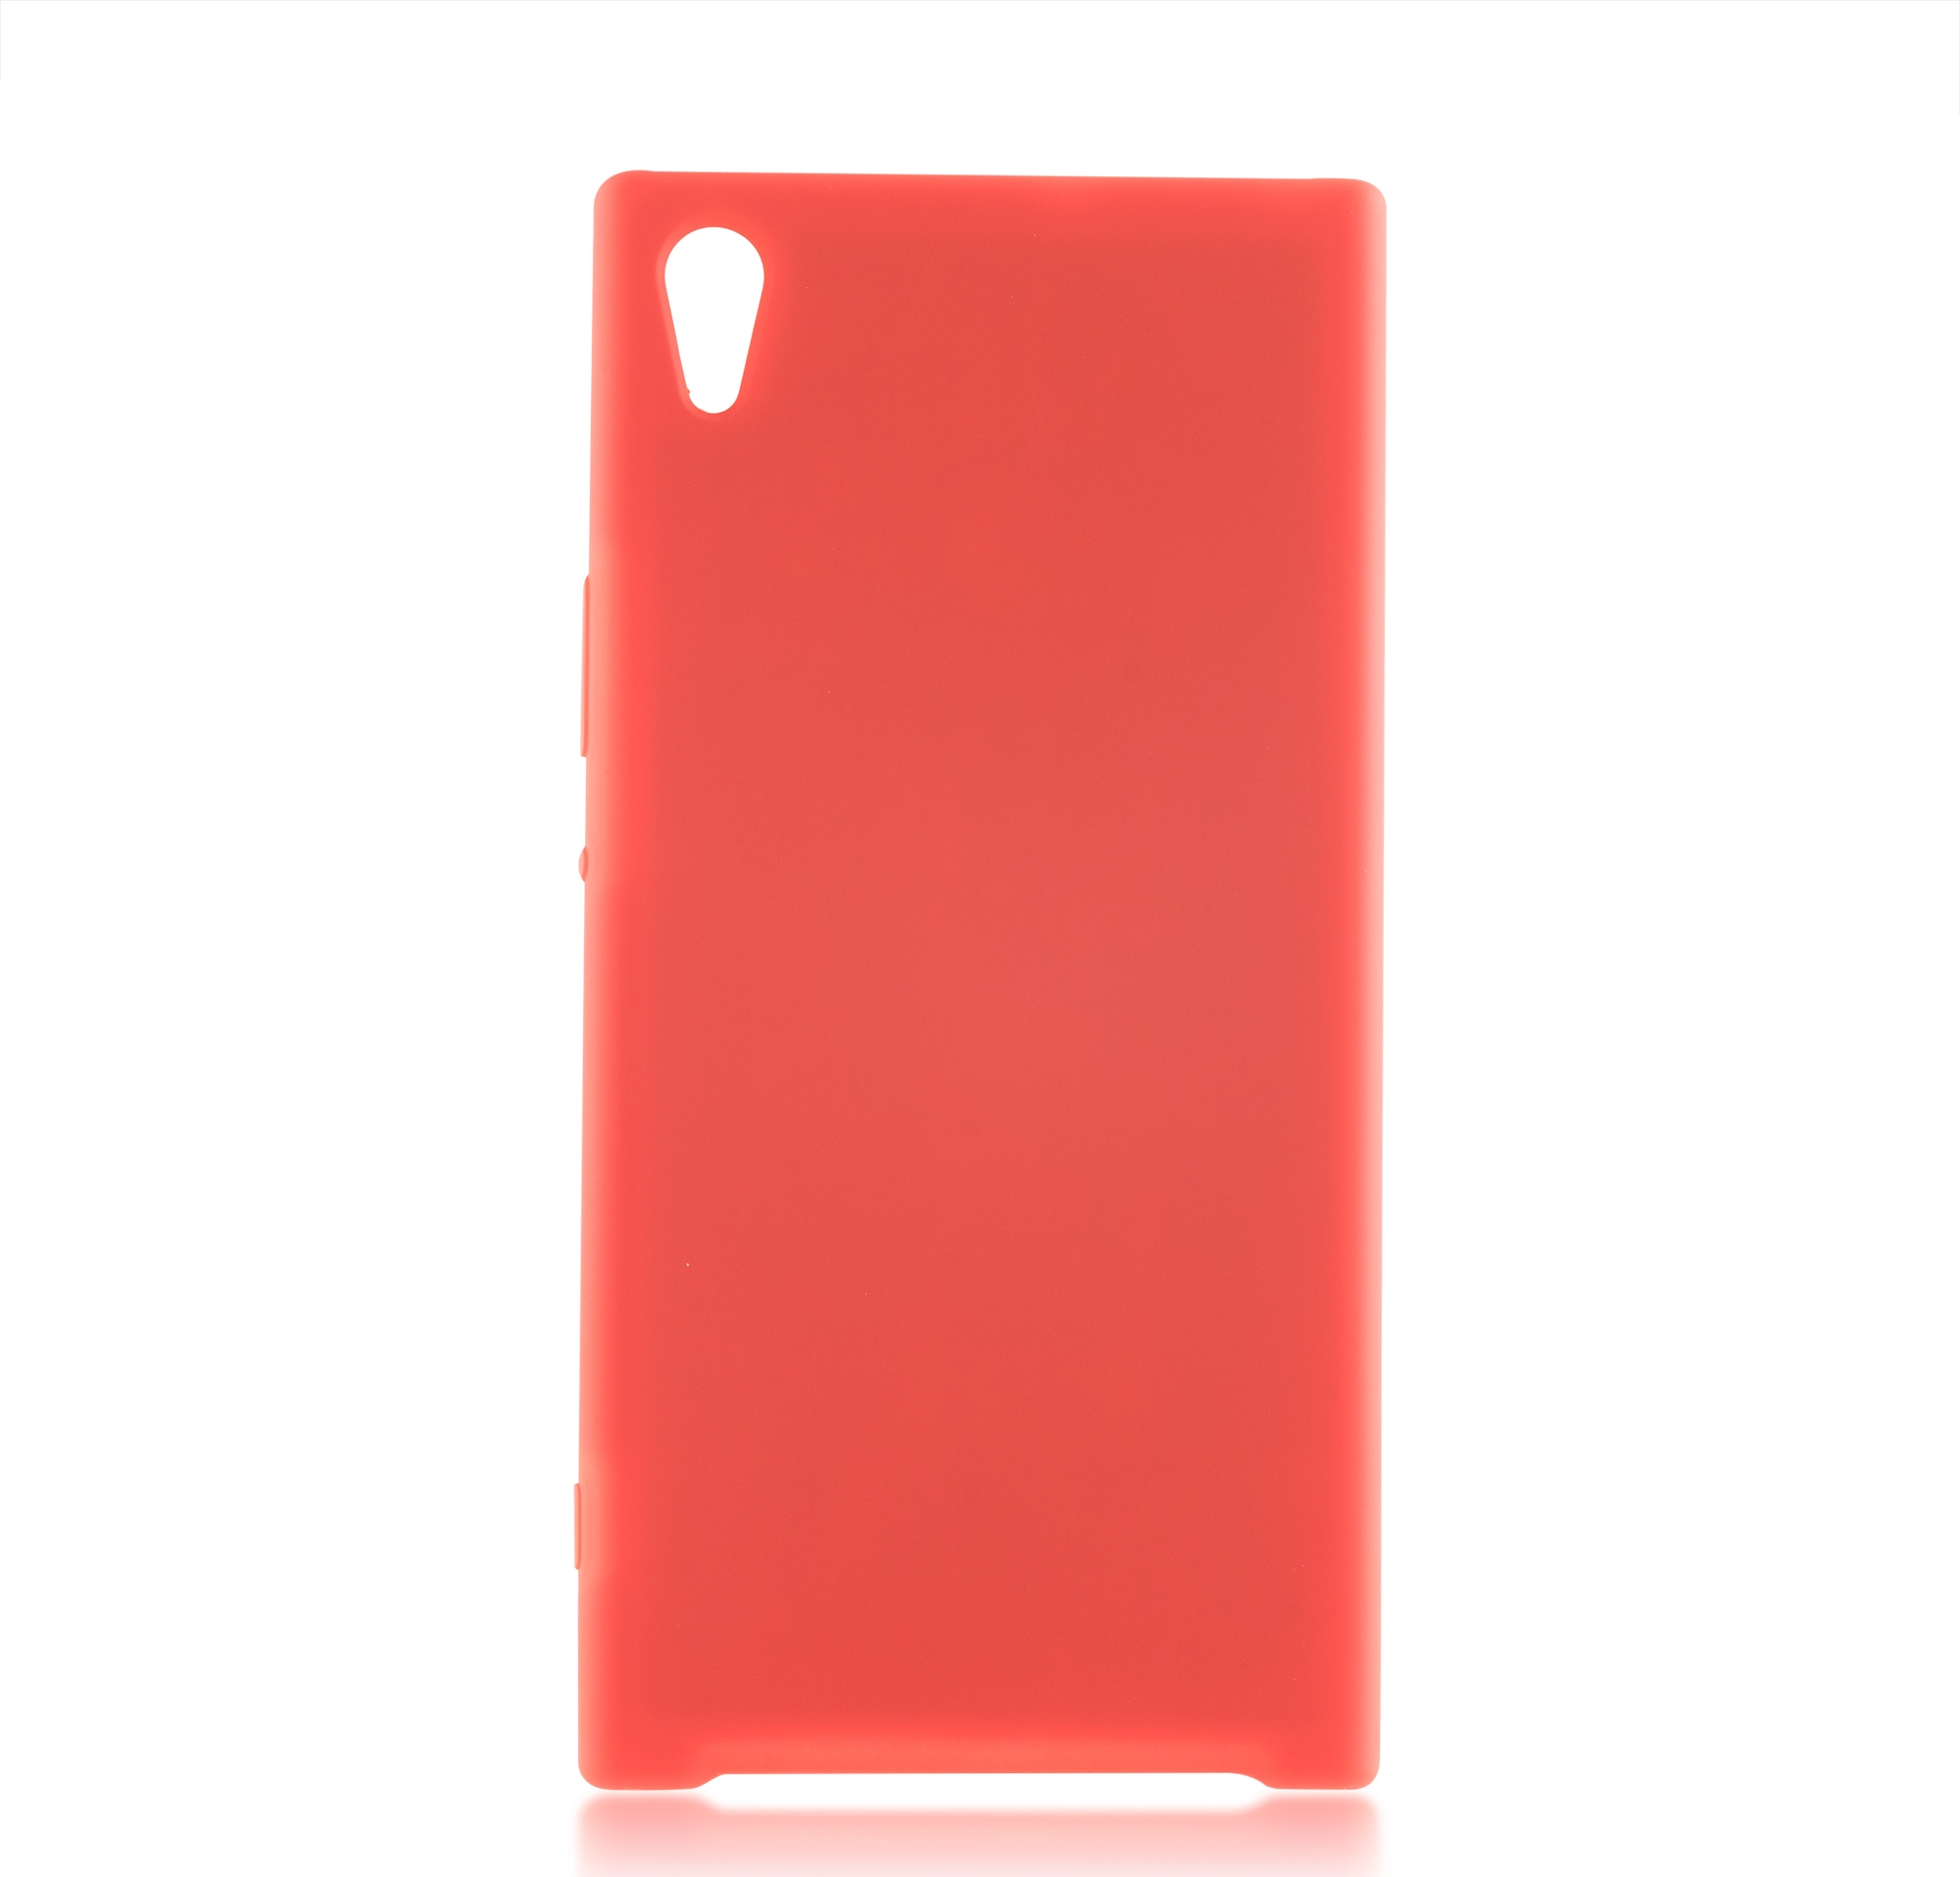 Чехол Brosco Softrubber для Sony Xperia XA1 Ultra, красный цена и фото